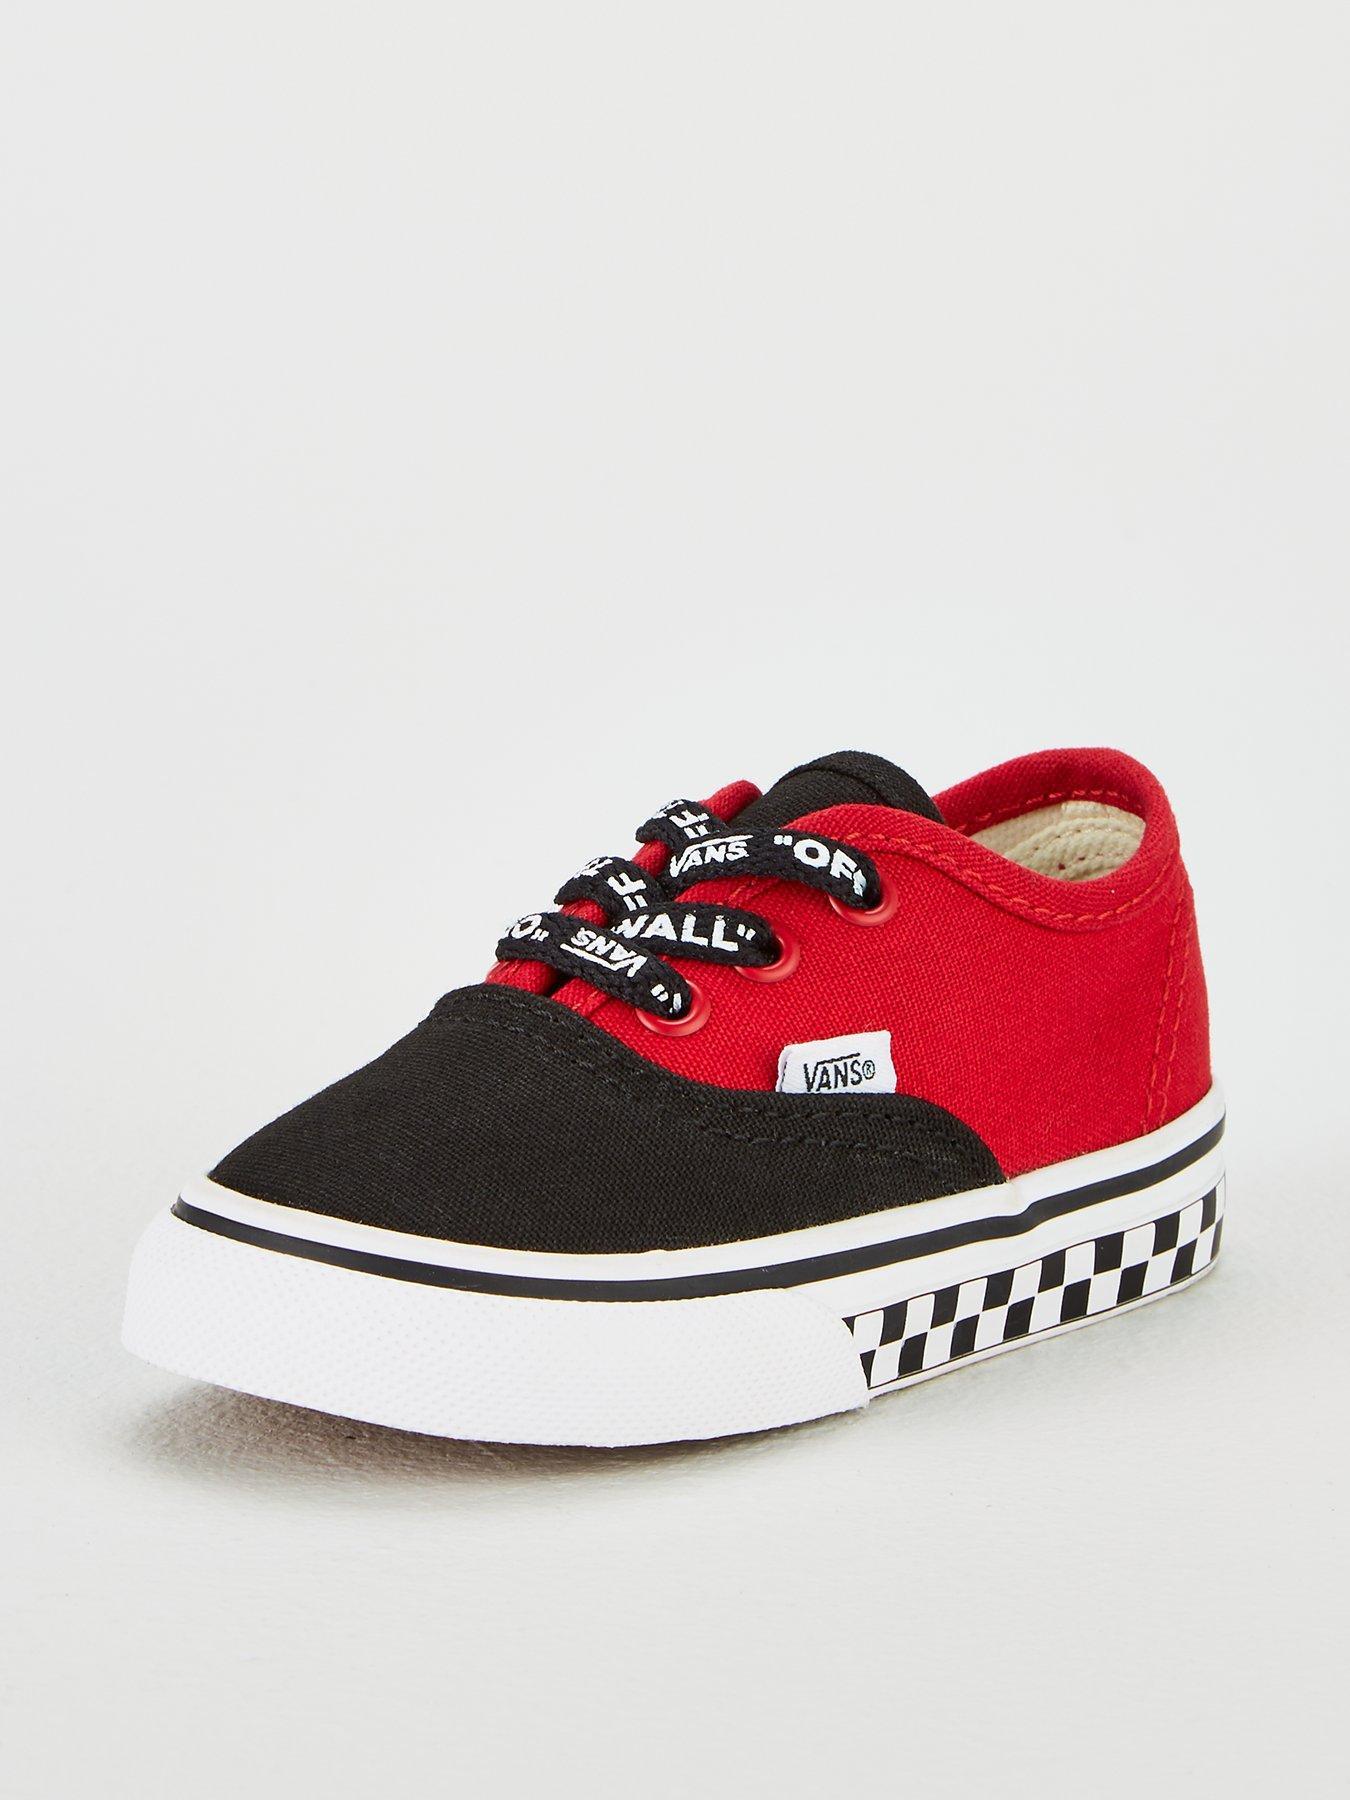 Clothing, Shoes & Accessories Smart Toddler Infant Vans Size 6 Boys' Shoes